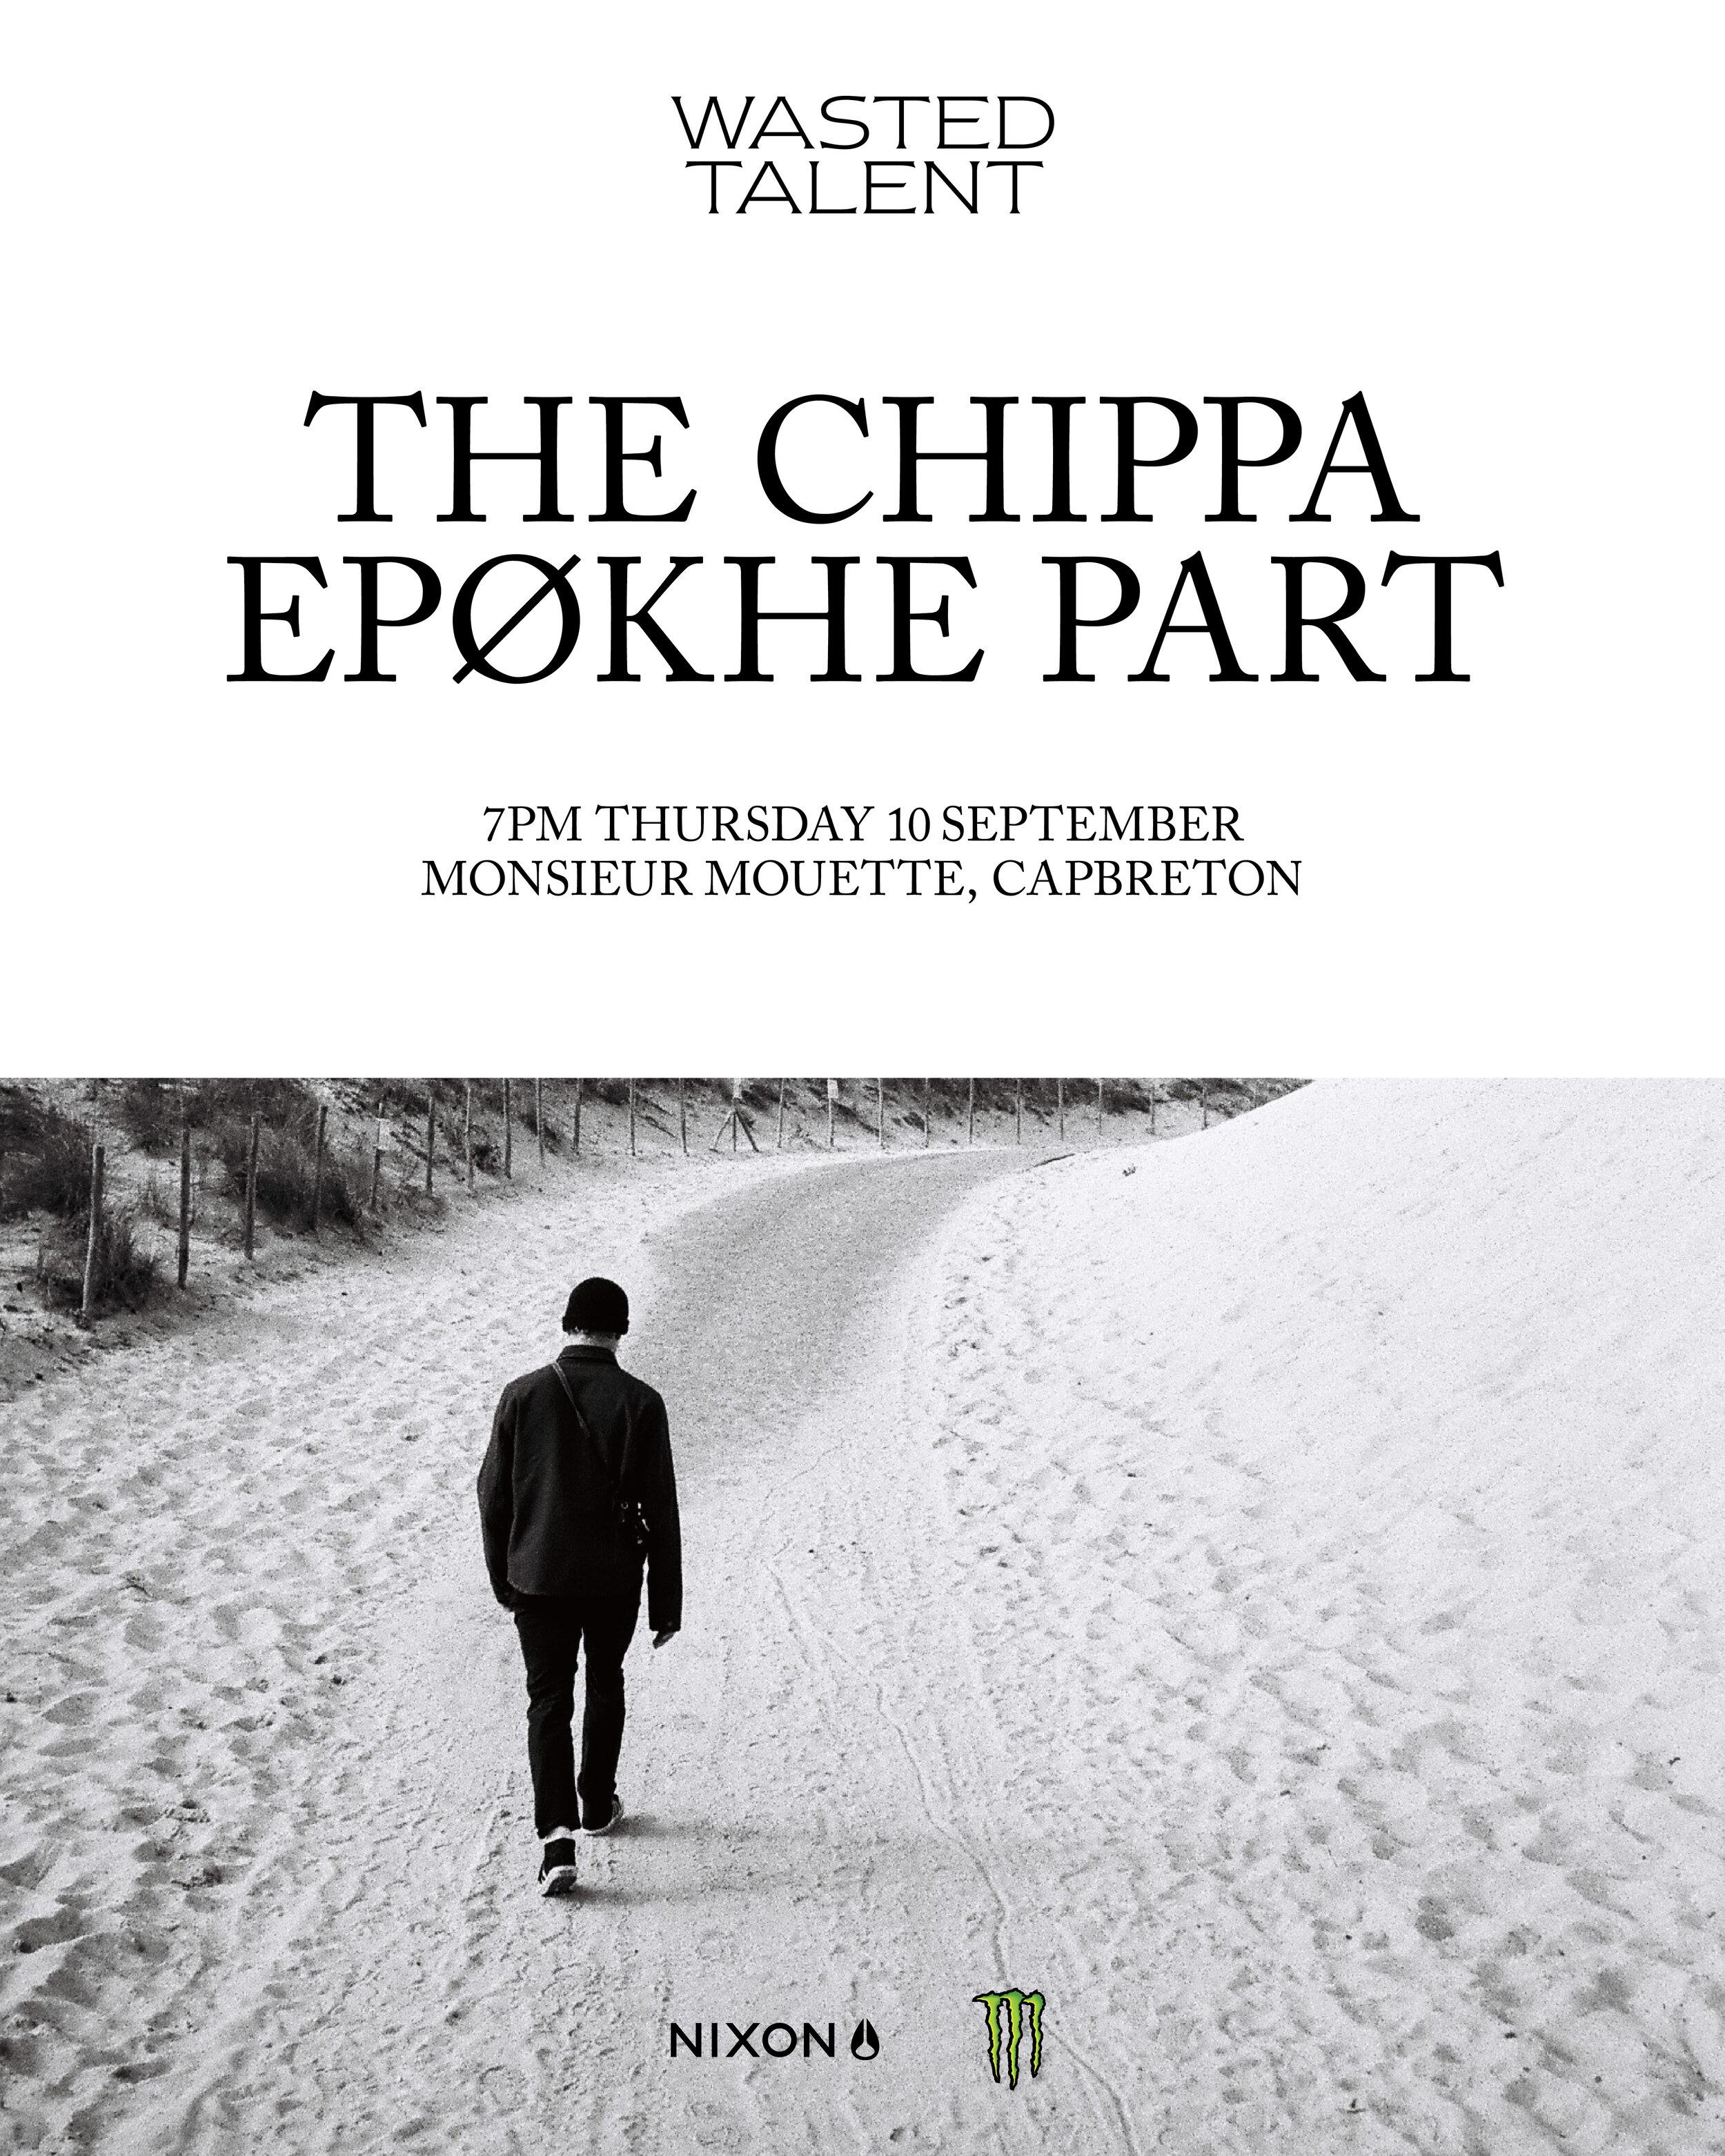 WT_Epokhe Chippa Part_IG Post.jpg